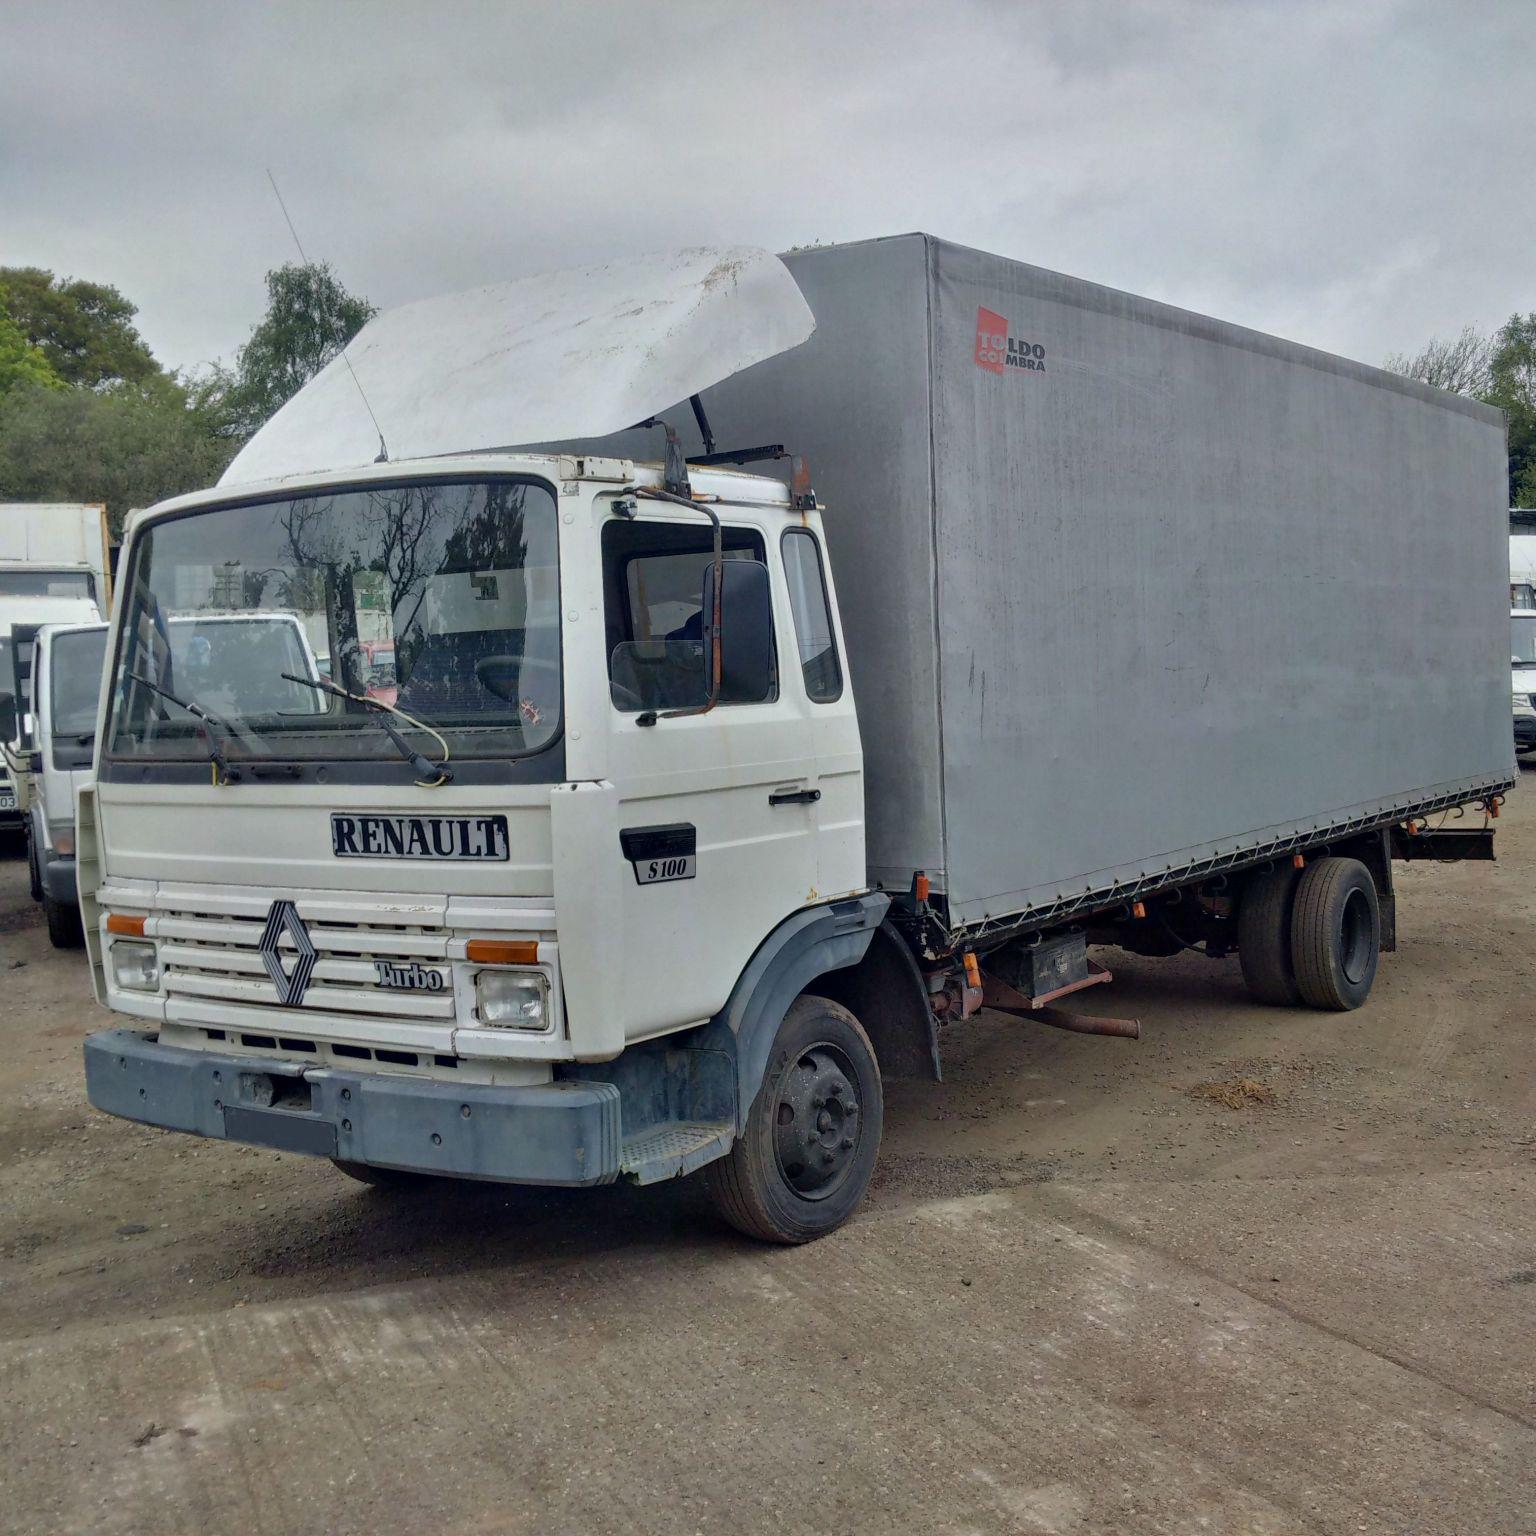 Left hand drive Renault Midliner S100 7.7 Ton tilt truck.